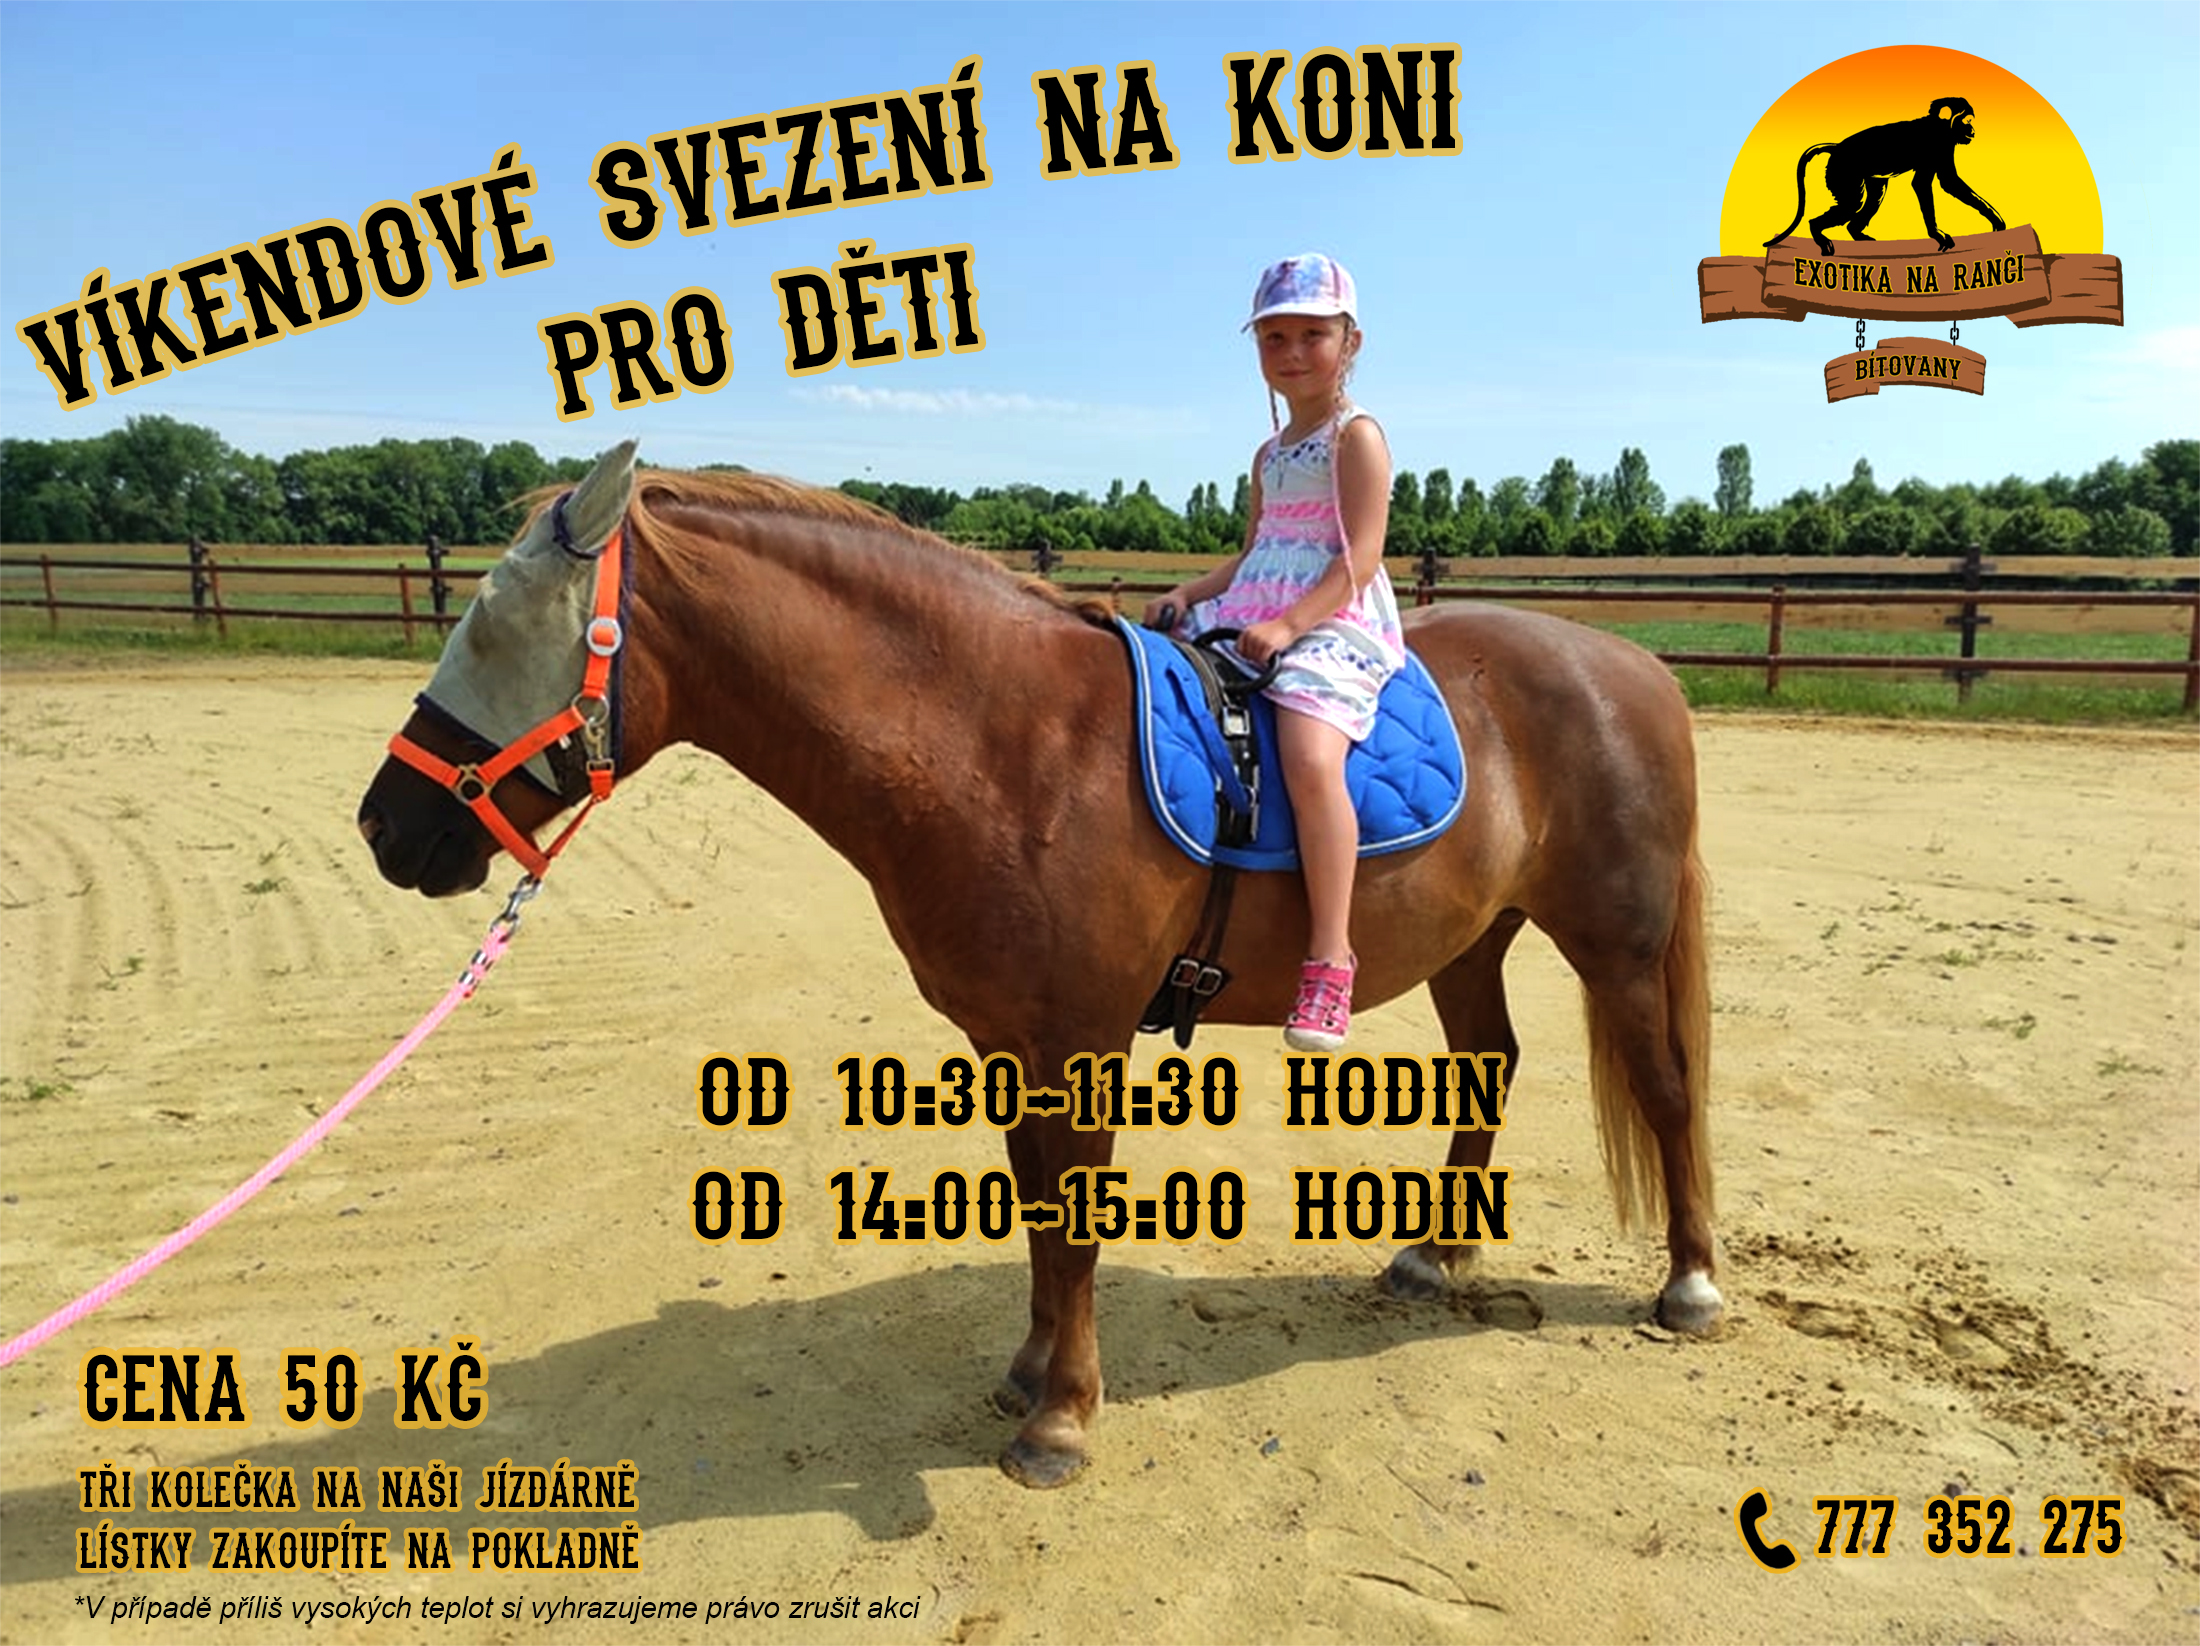 Svezeni na koni